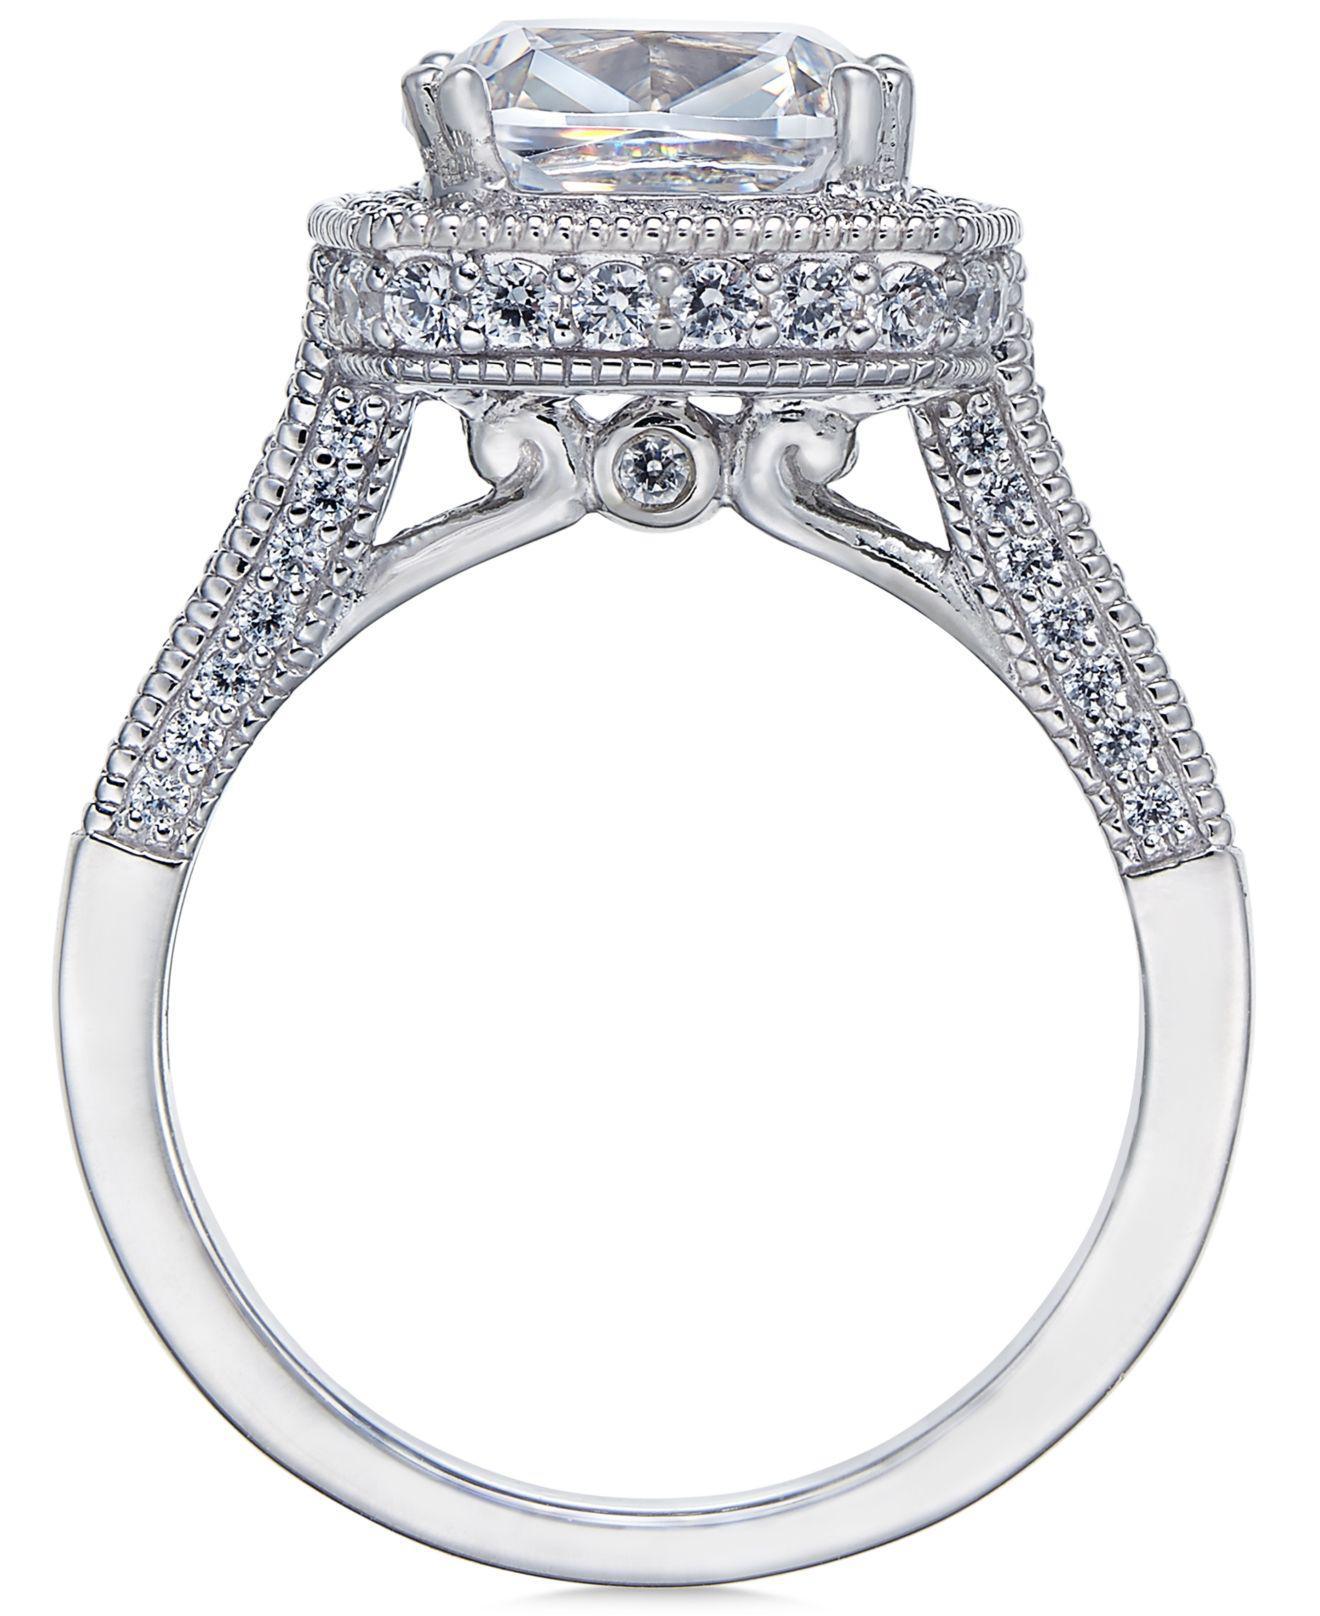 b2232fdd7 Arabella Sterling Silver Ring Set, Swarovski Zirconia Bridal Ring And Band  Set (7-5/8 Ct. T.w.) in Metallic - Lyst